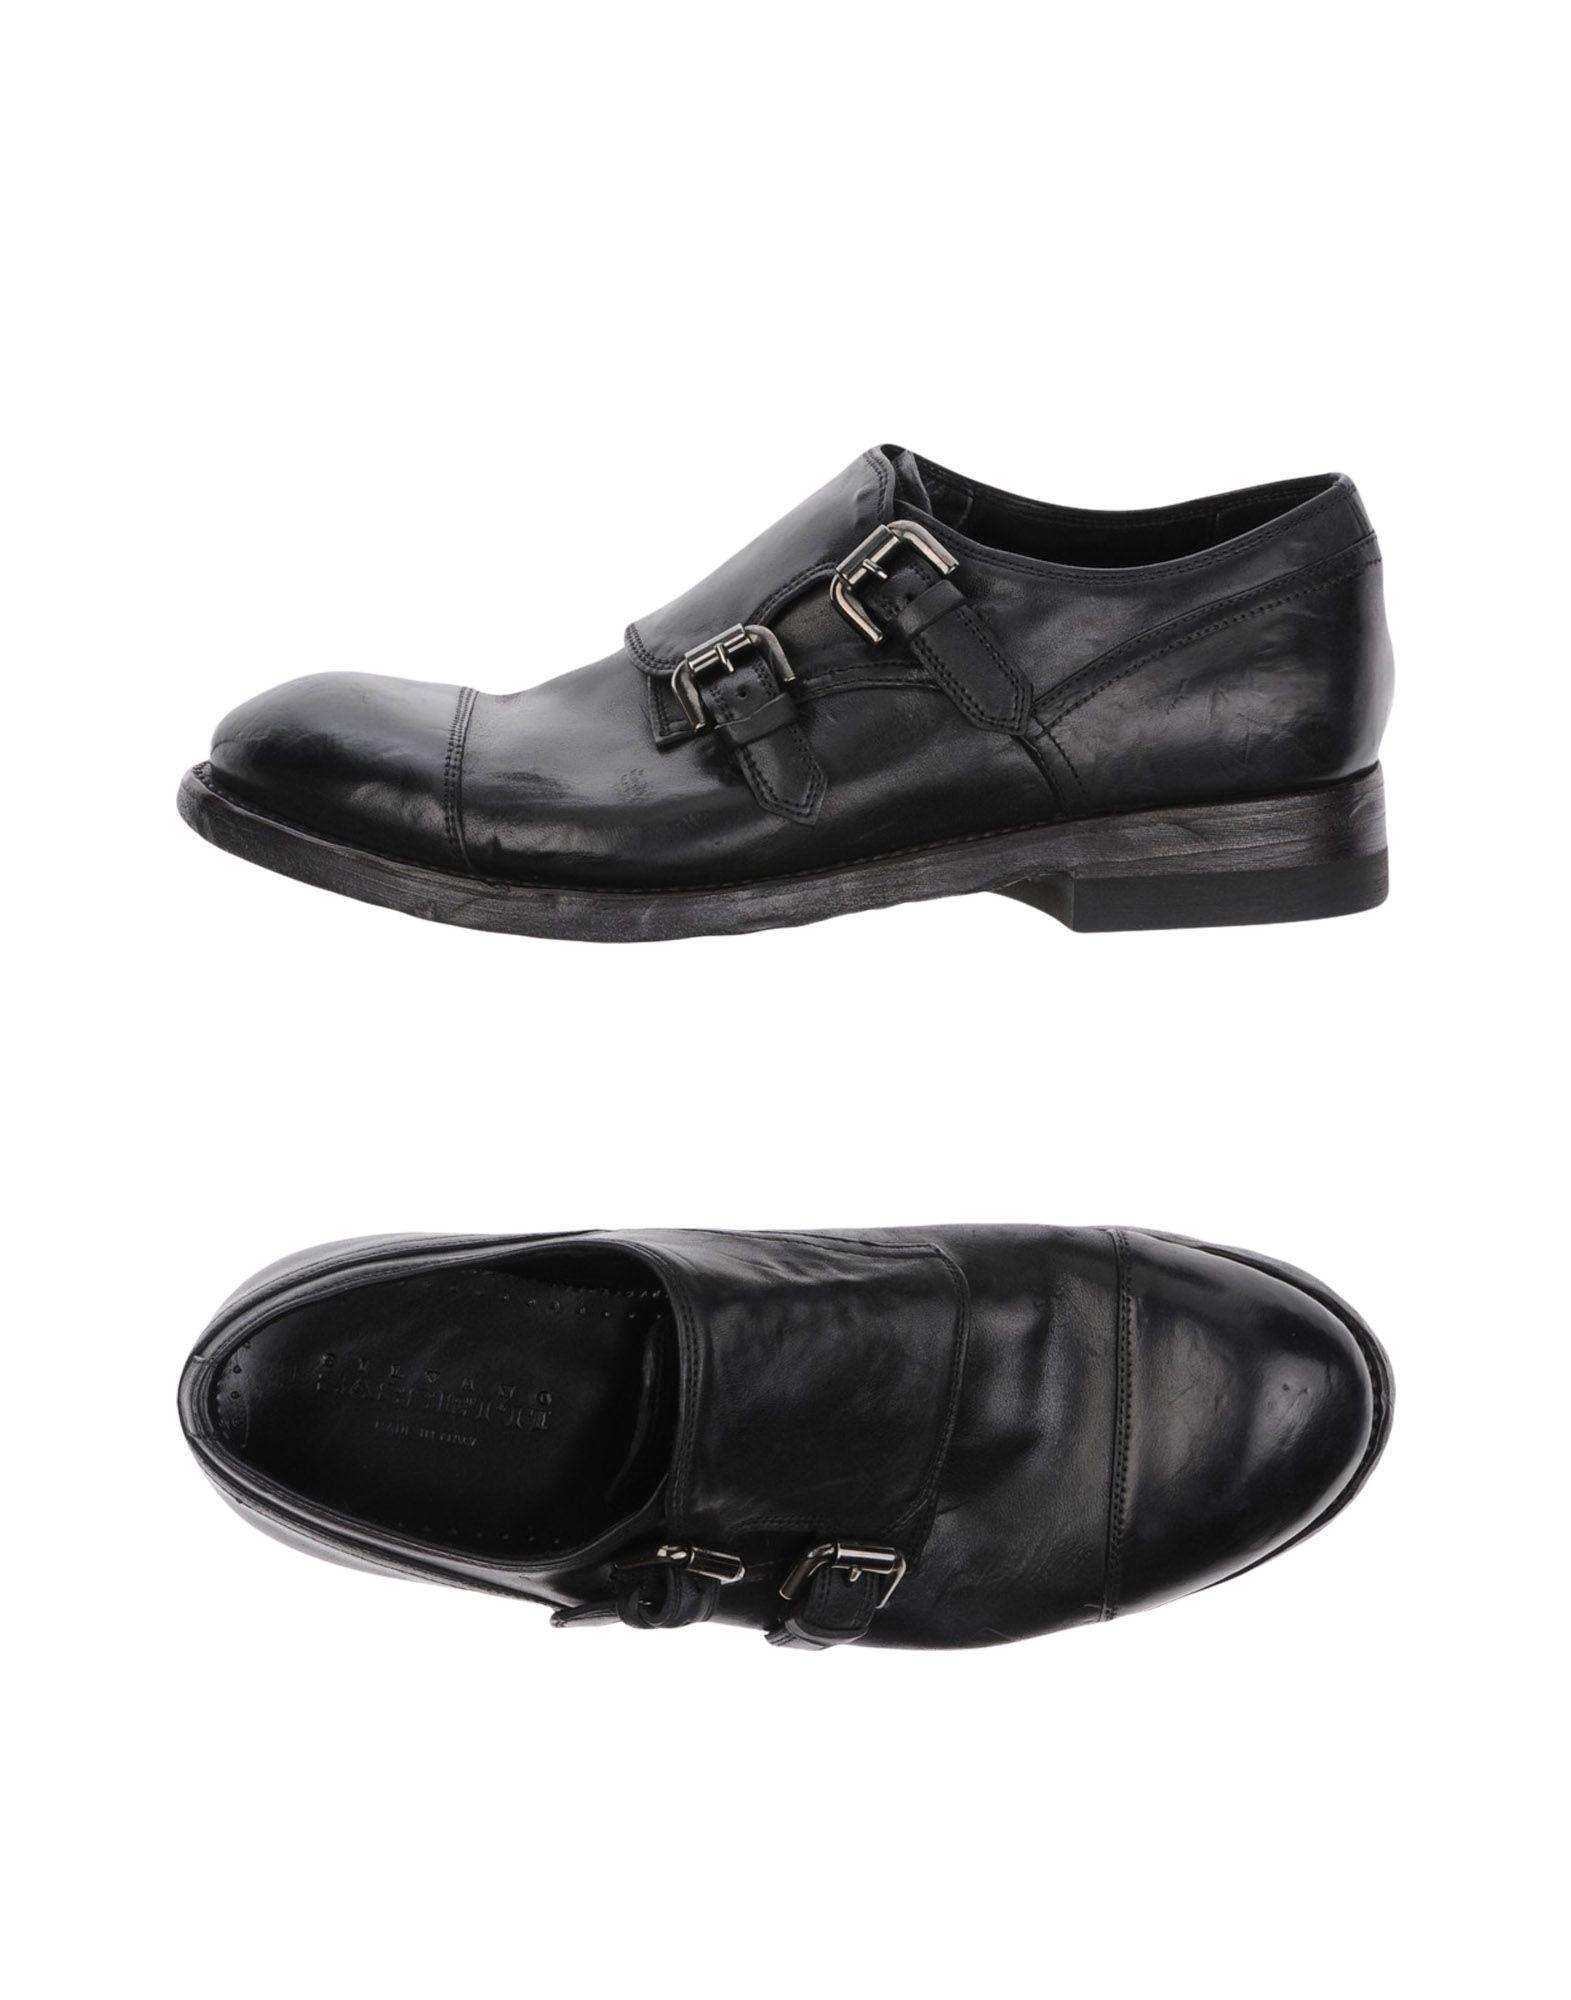 Silvano Sassetti Mokassins Herren  11286416MA Gute Qualität beliebte Schuhe